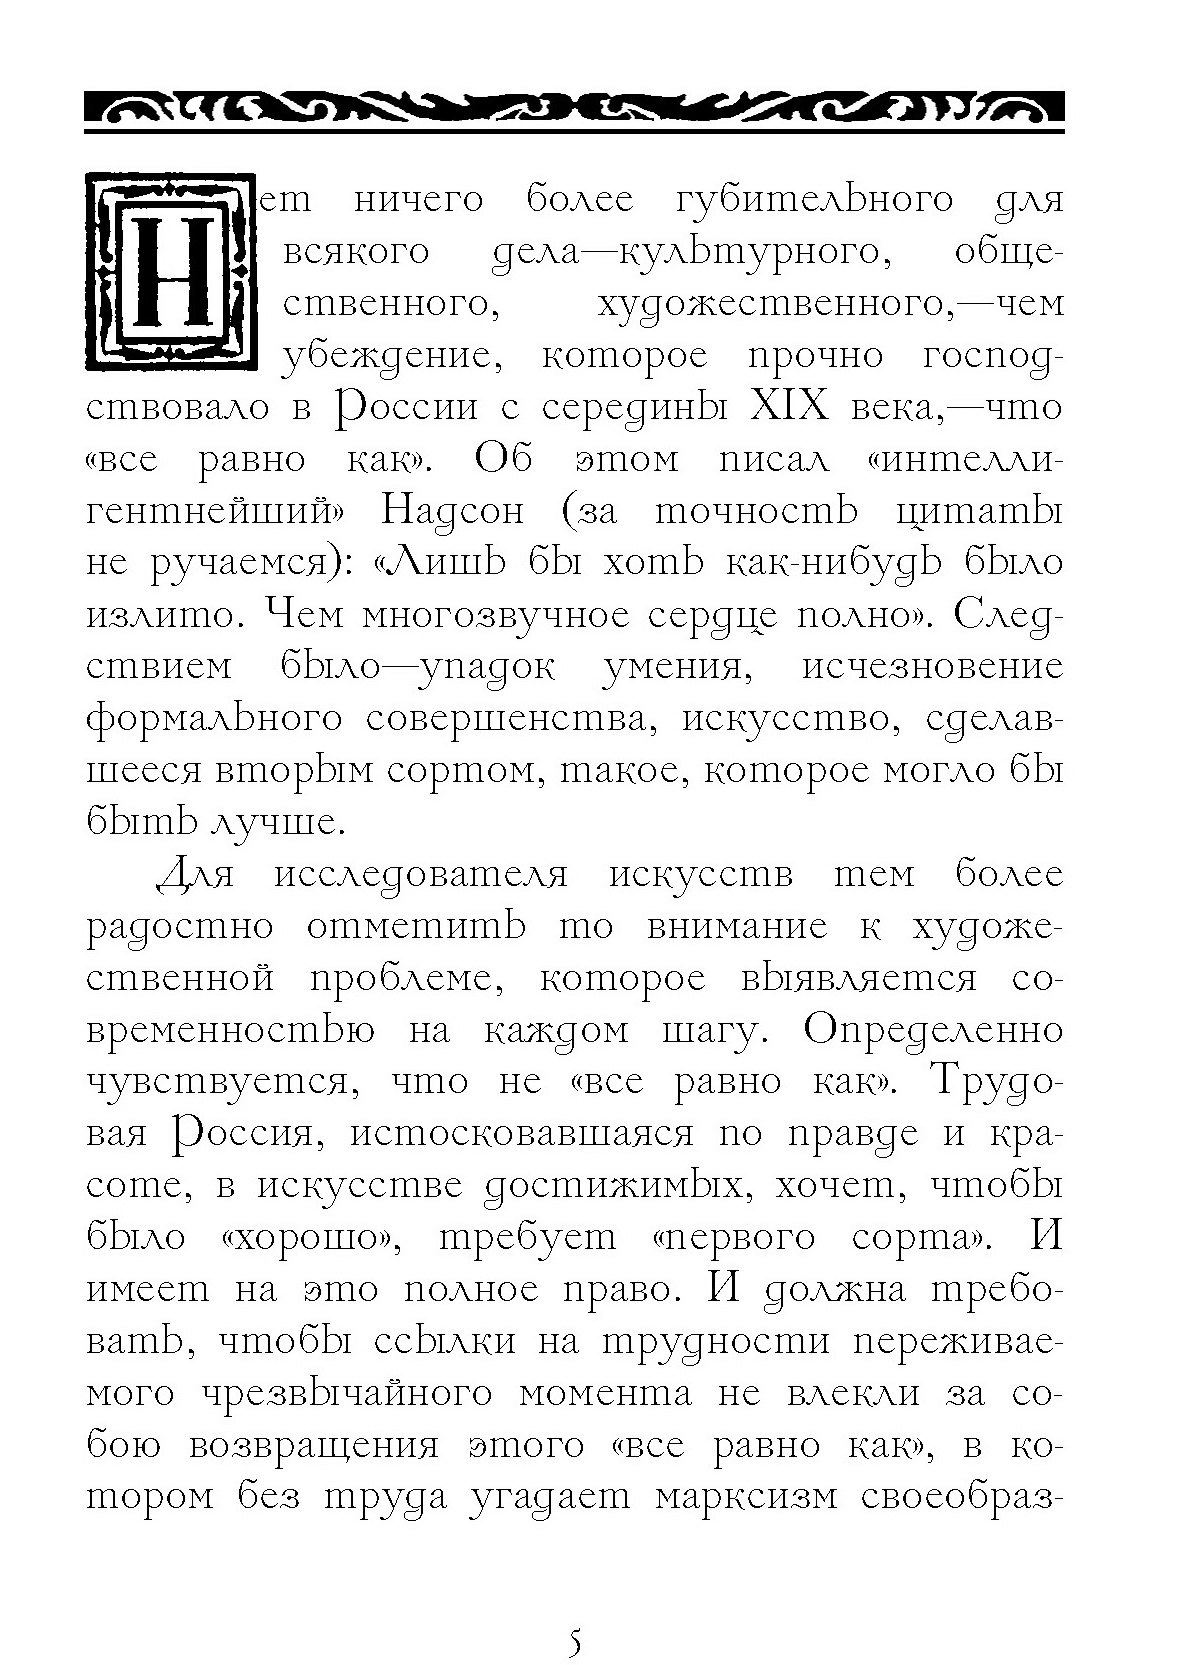 А.А.Сидоров - Искусство книги, 1922